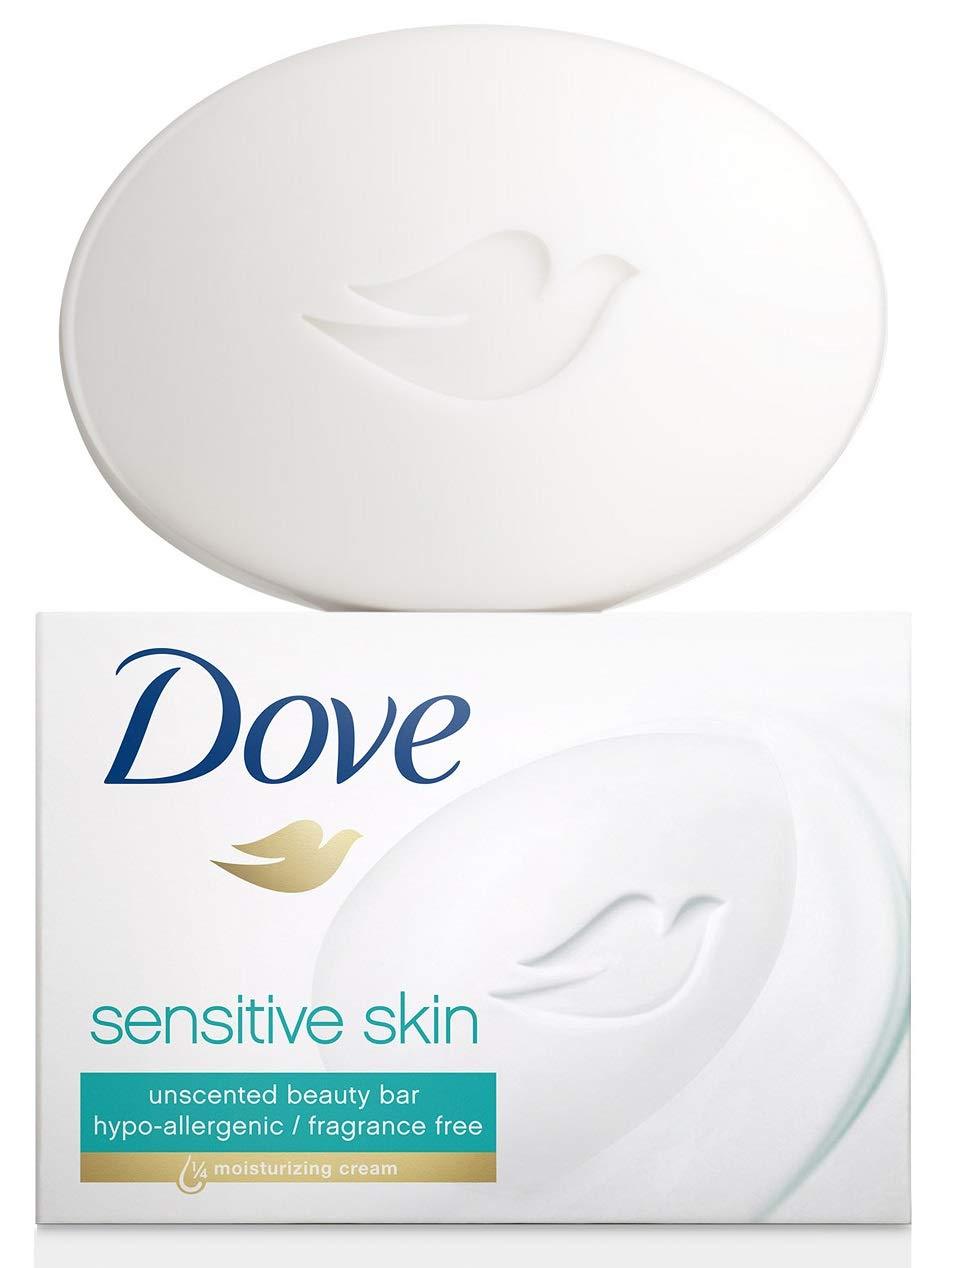 Dove Beauty Bars Sensitive Skin, 12 Count, 3.52 Oz / 100 Grams Each